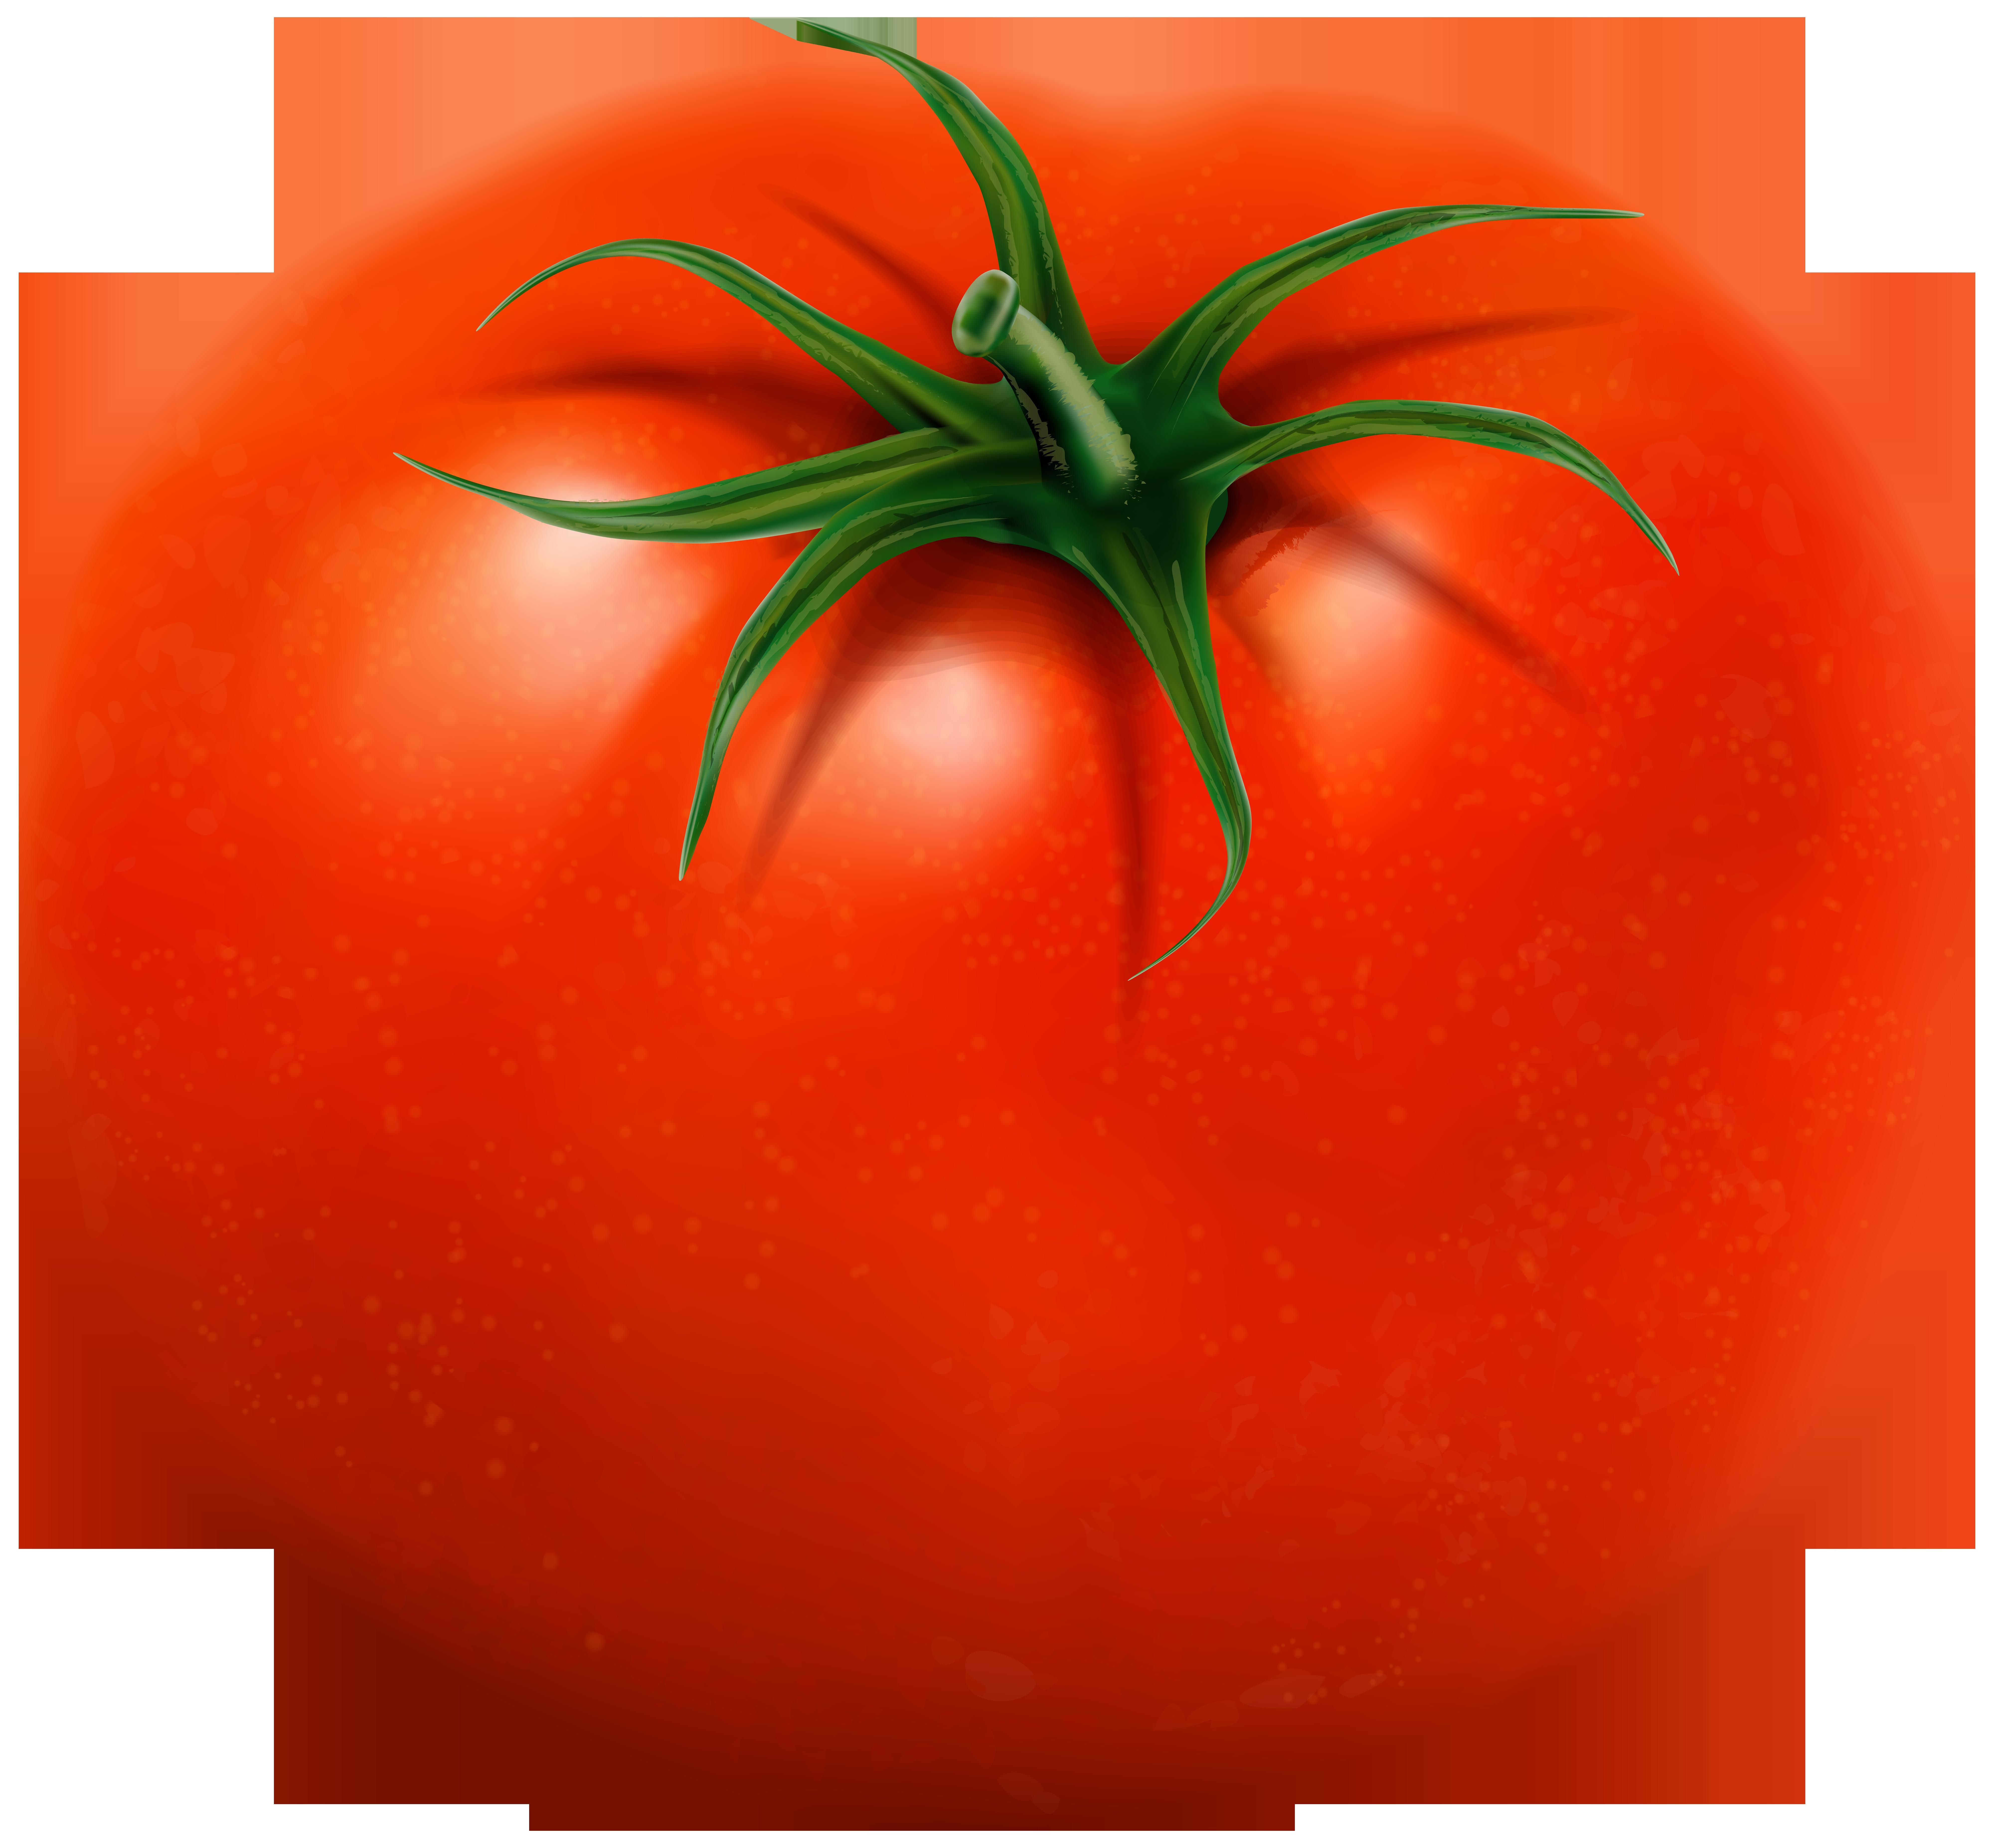 Tomato Transparent Clip Art Image.